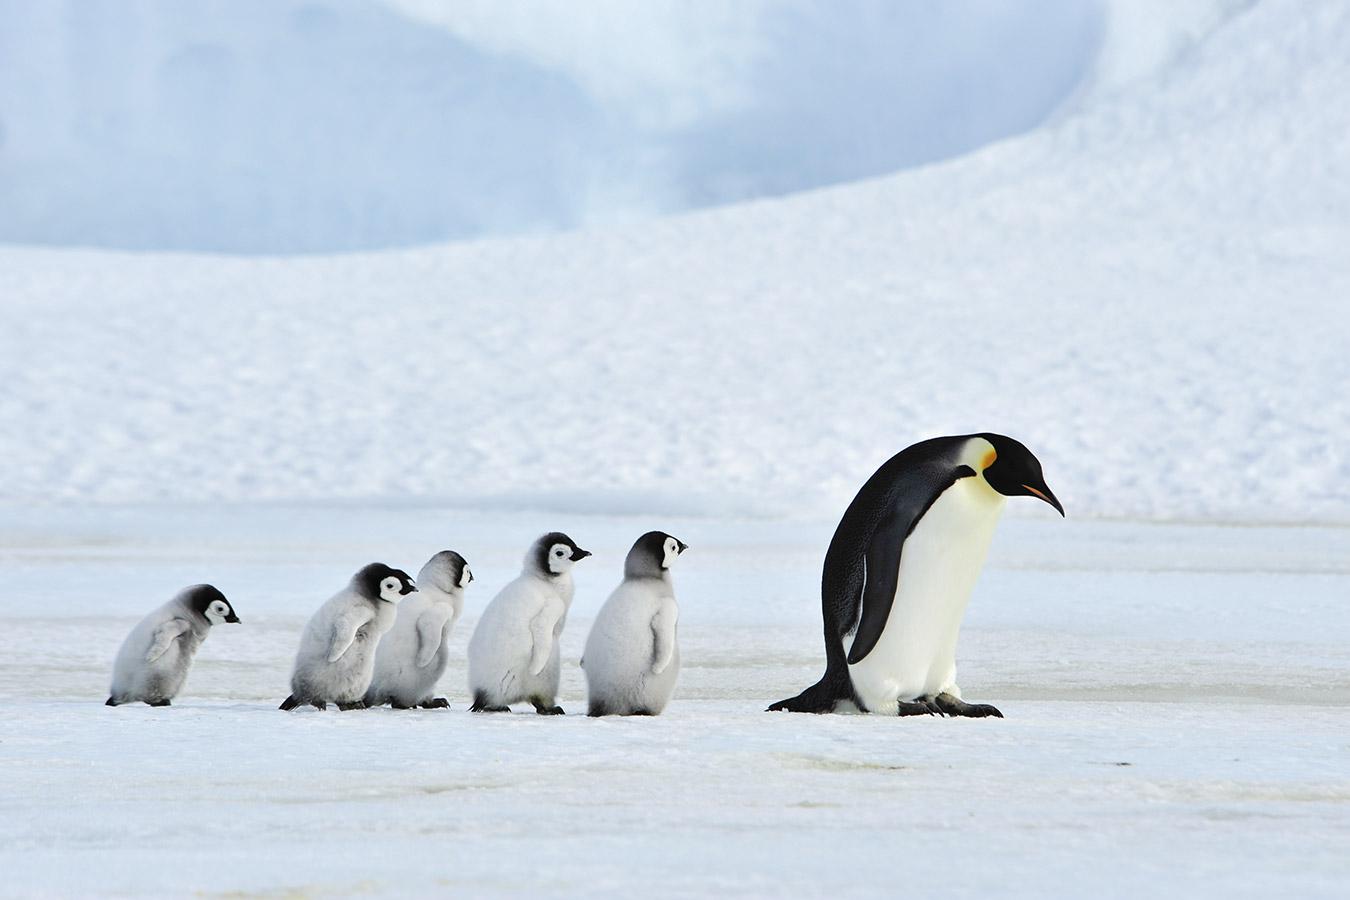 41-43-trening-pingvini-kriza-promjena-polumaratona